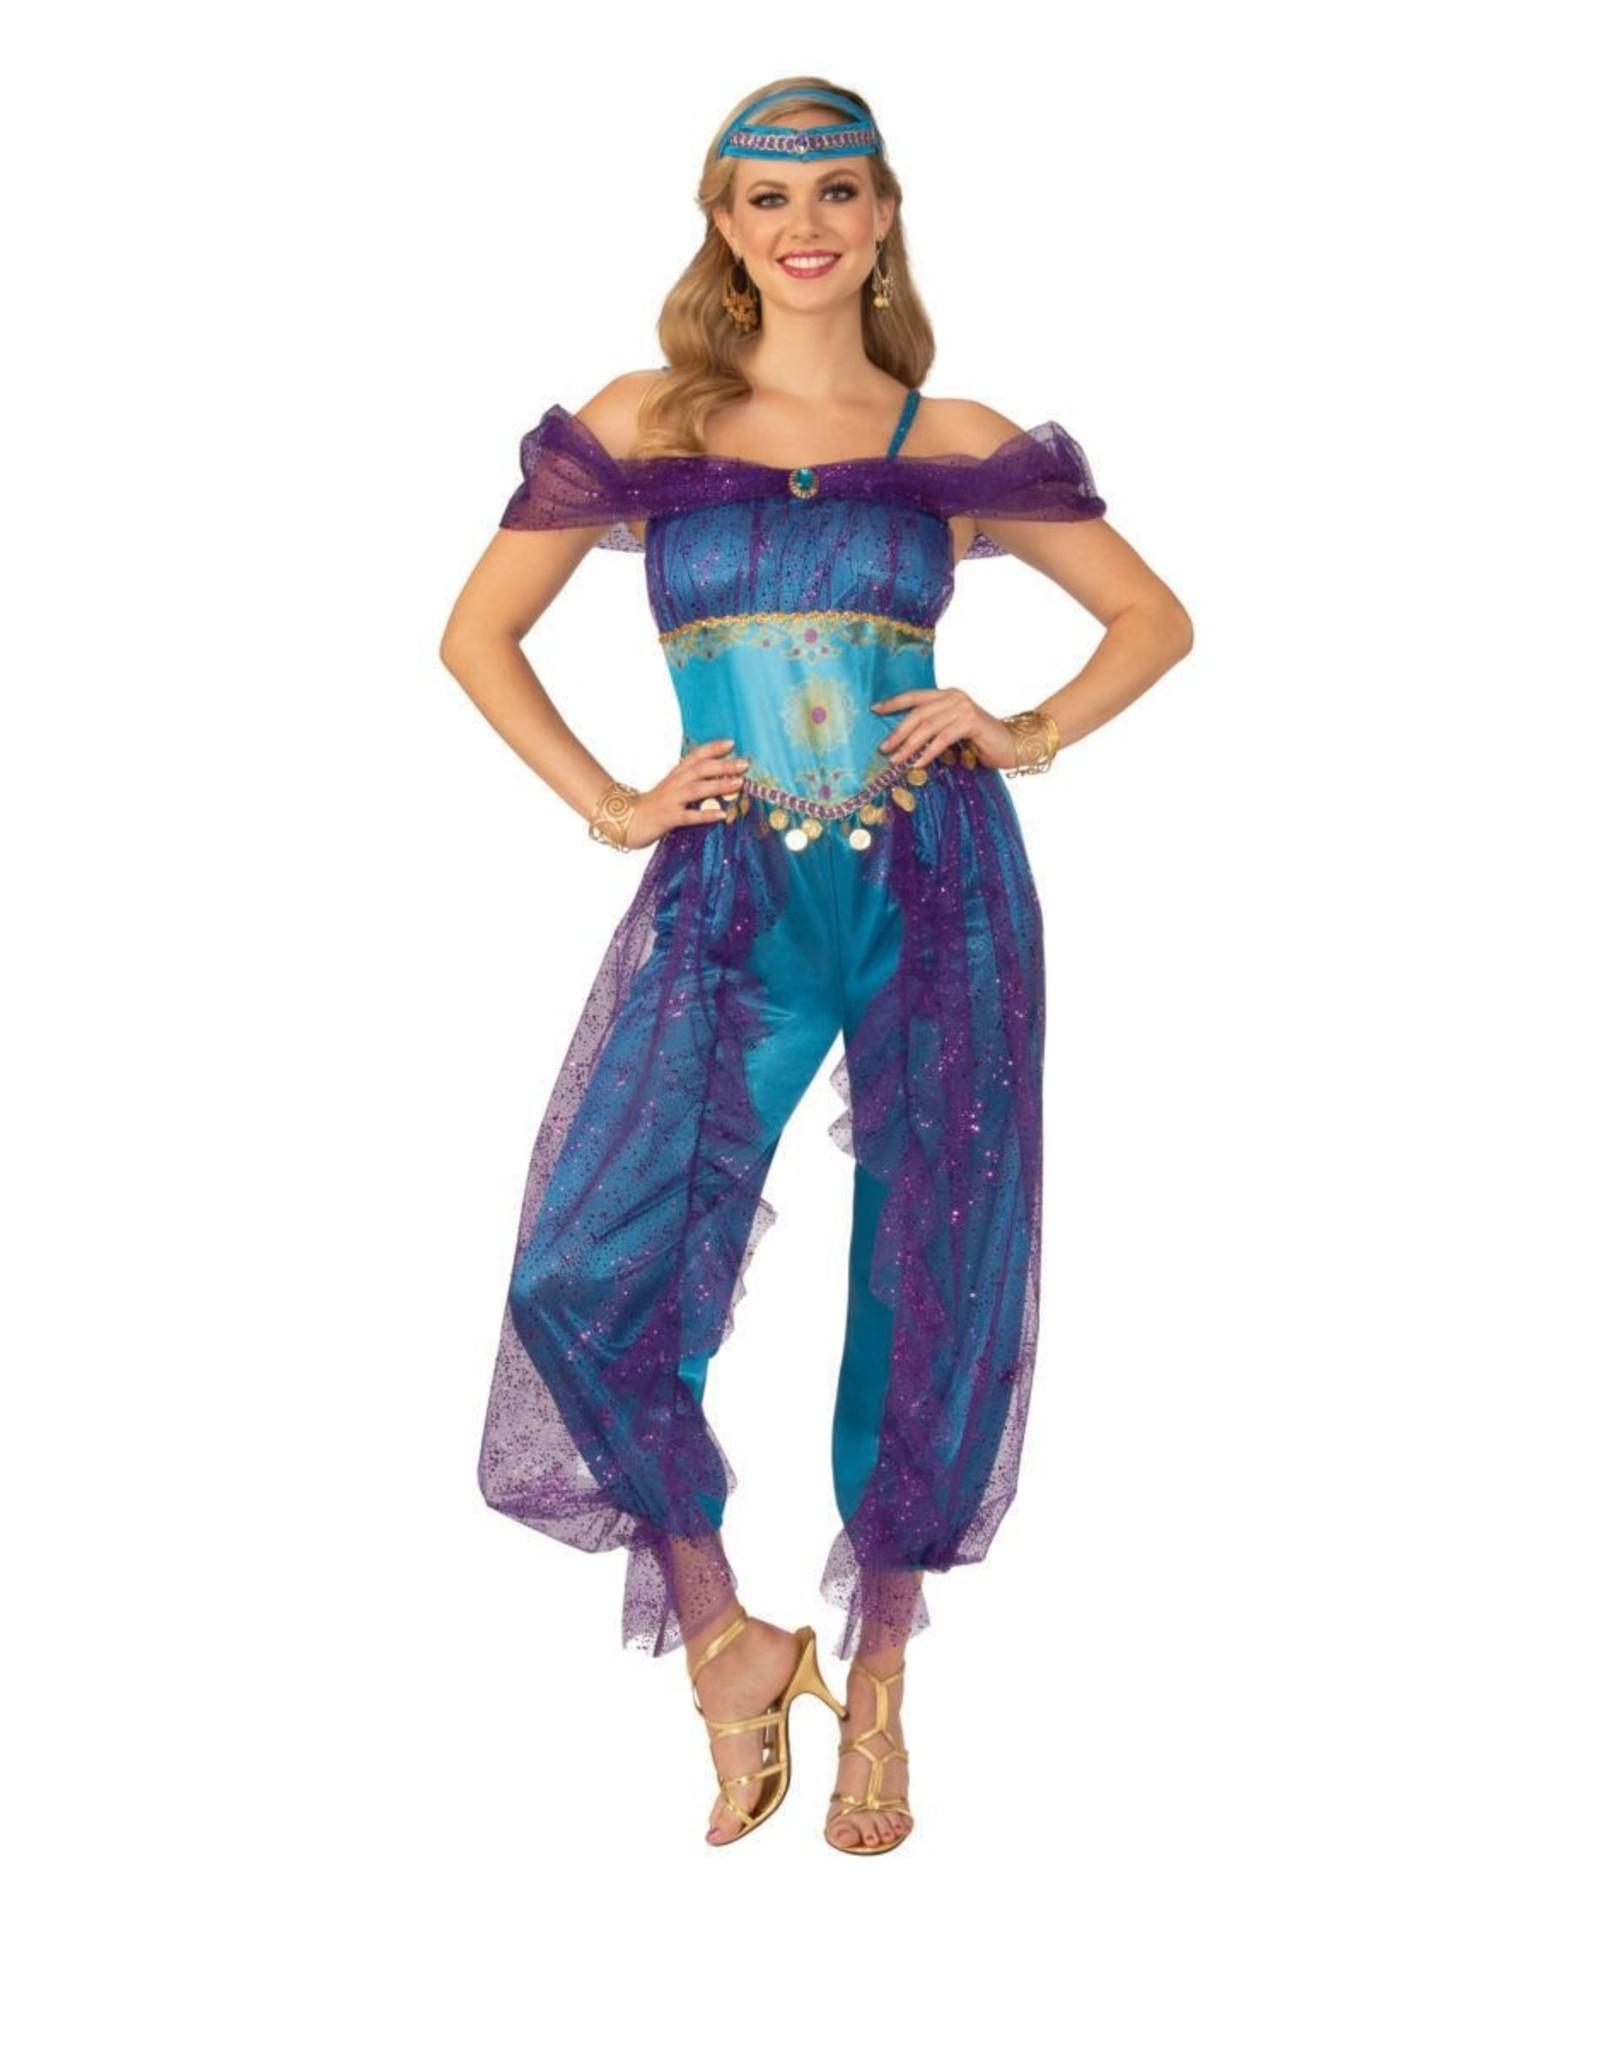 Rubies Costume Genie